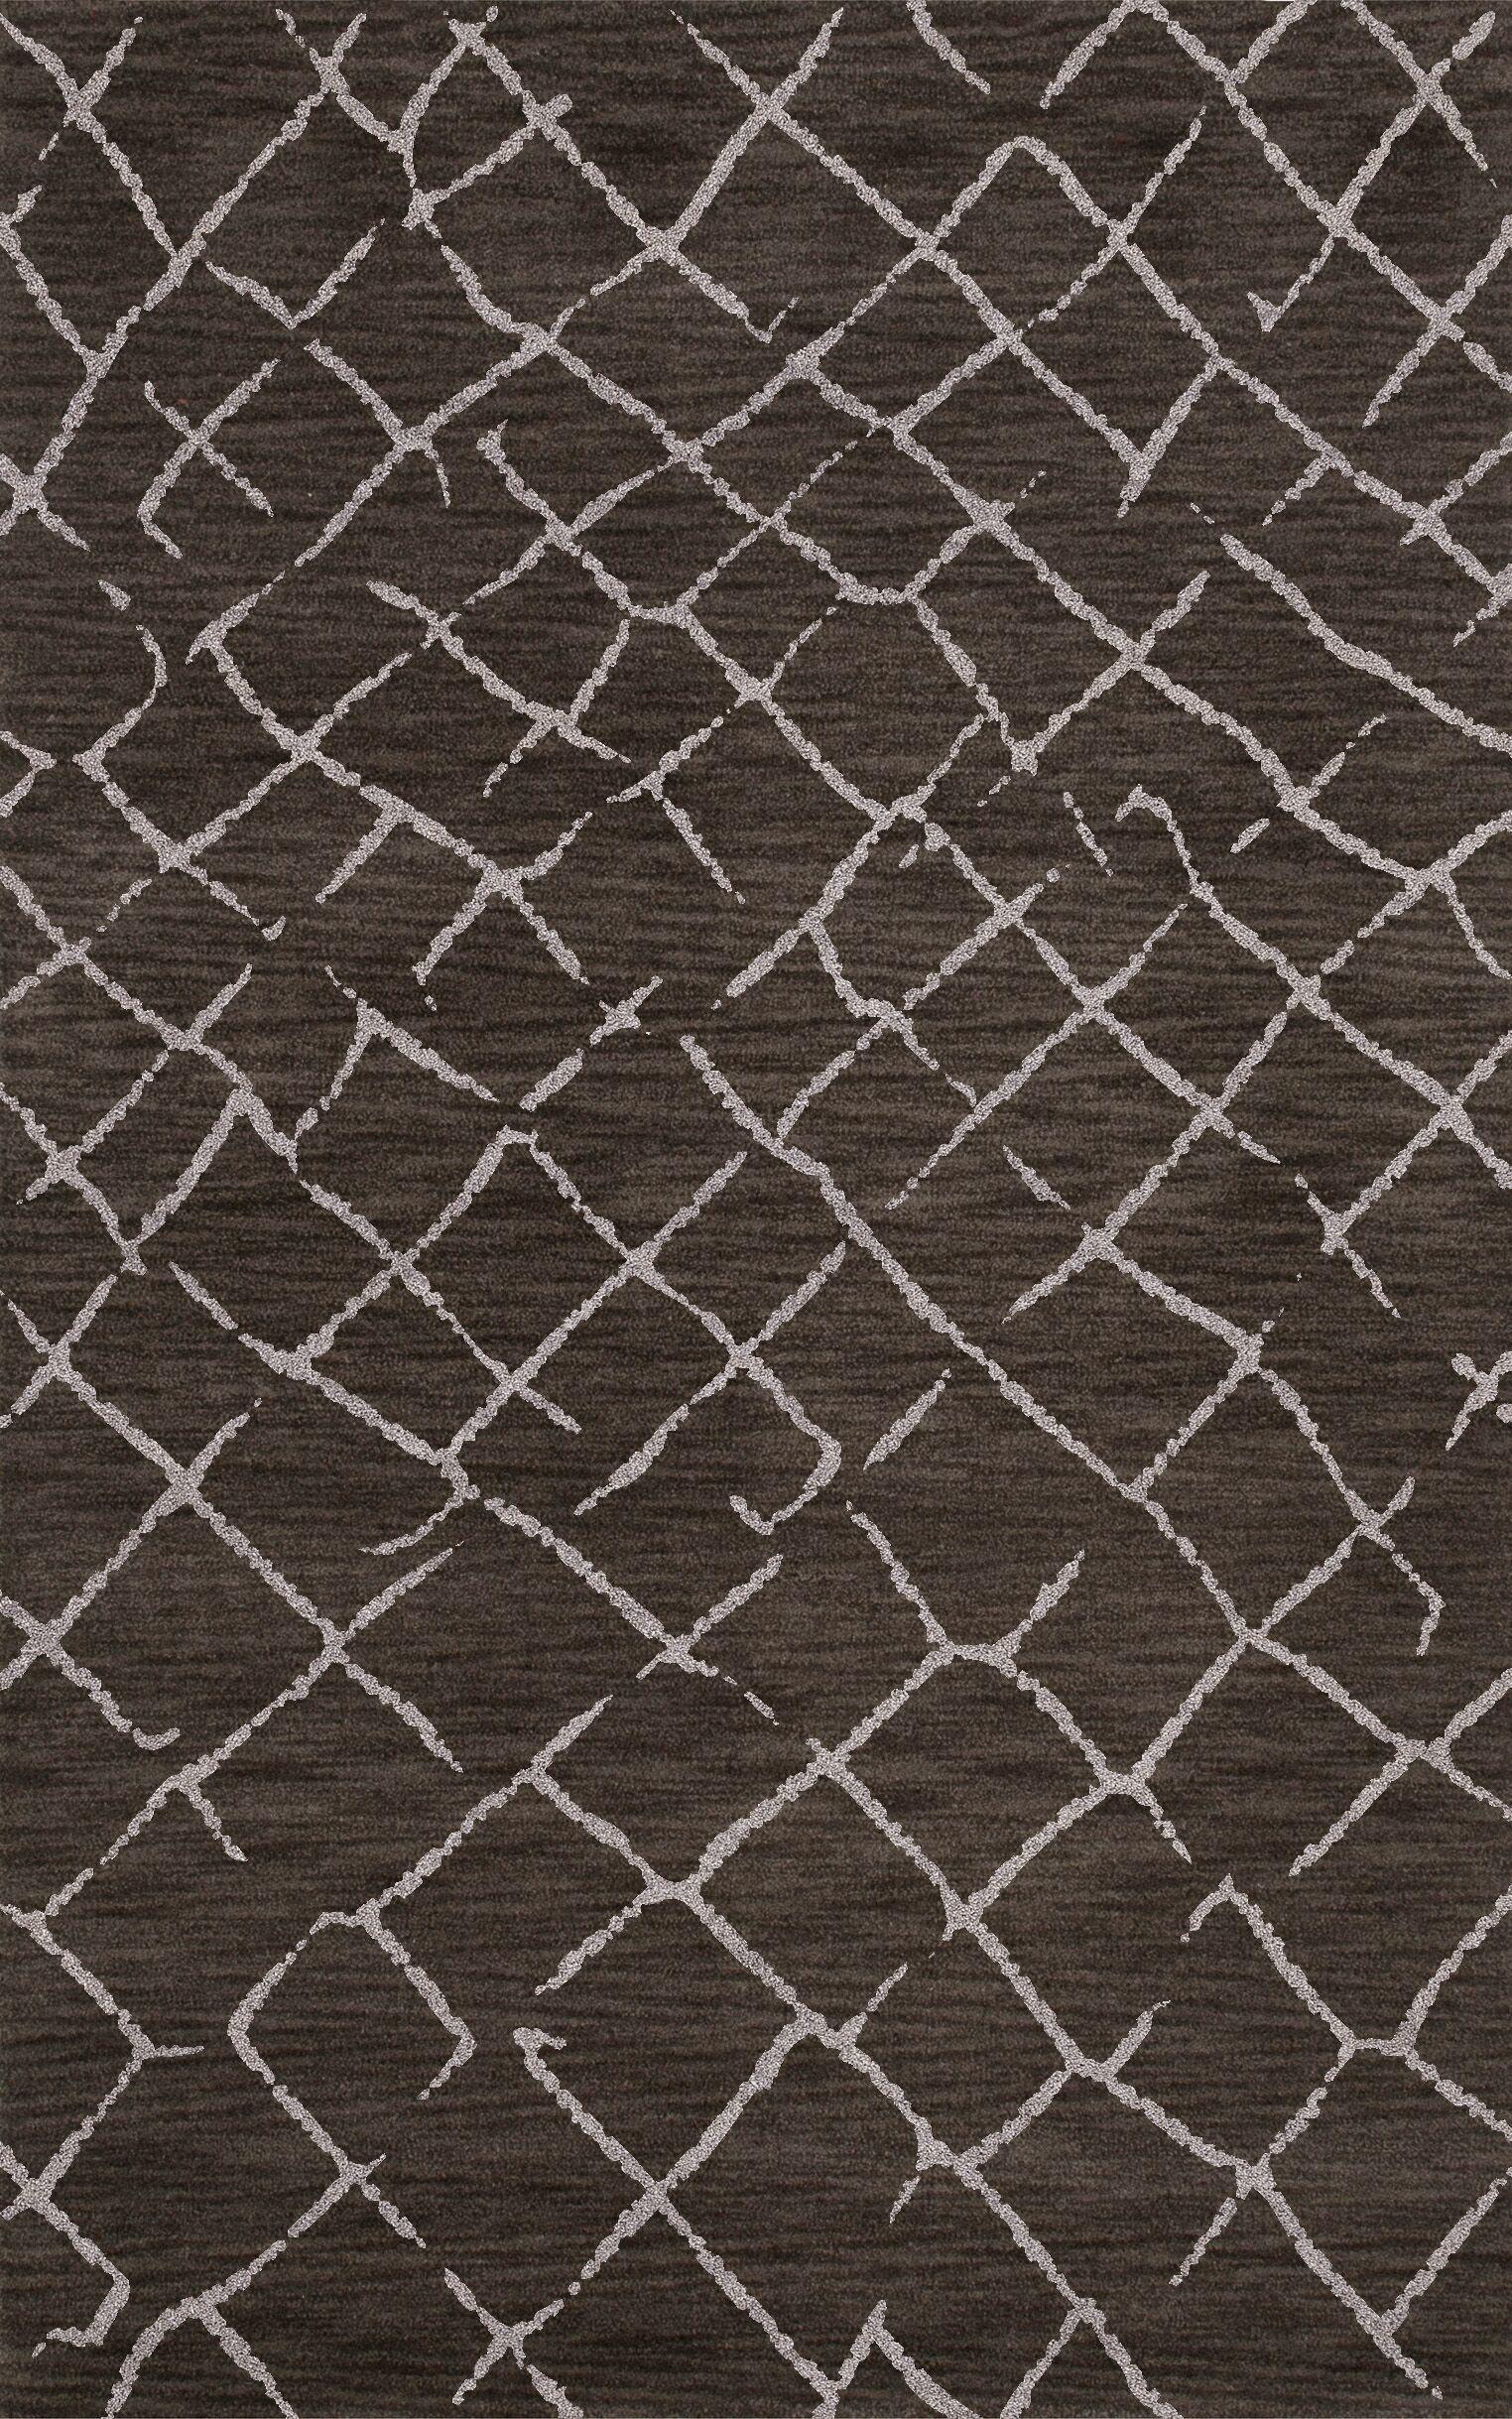 Bella Machine Woven Wool Gray Area Rug Rug Size: Rectangle 12' x 18'